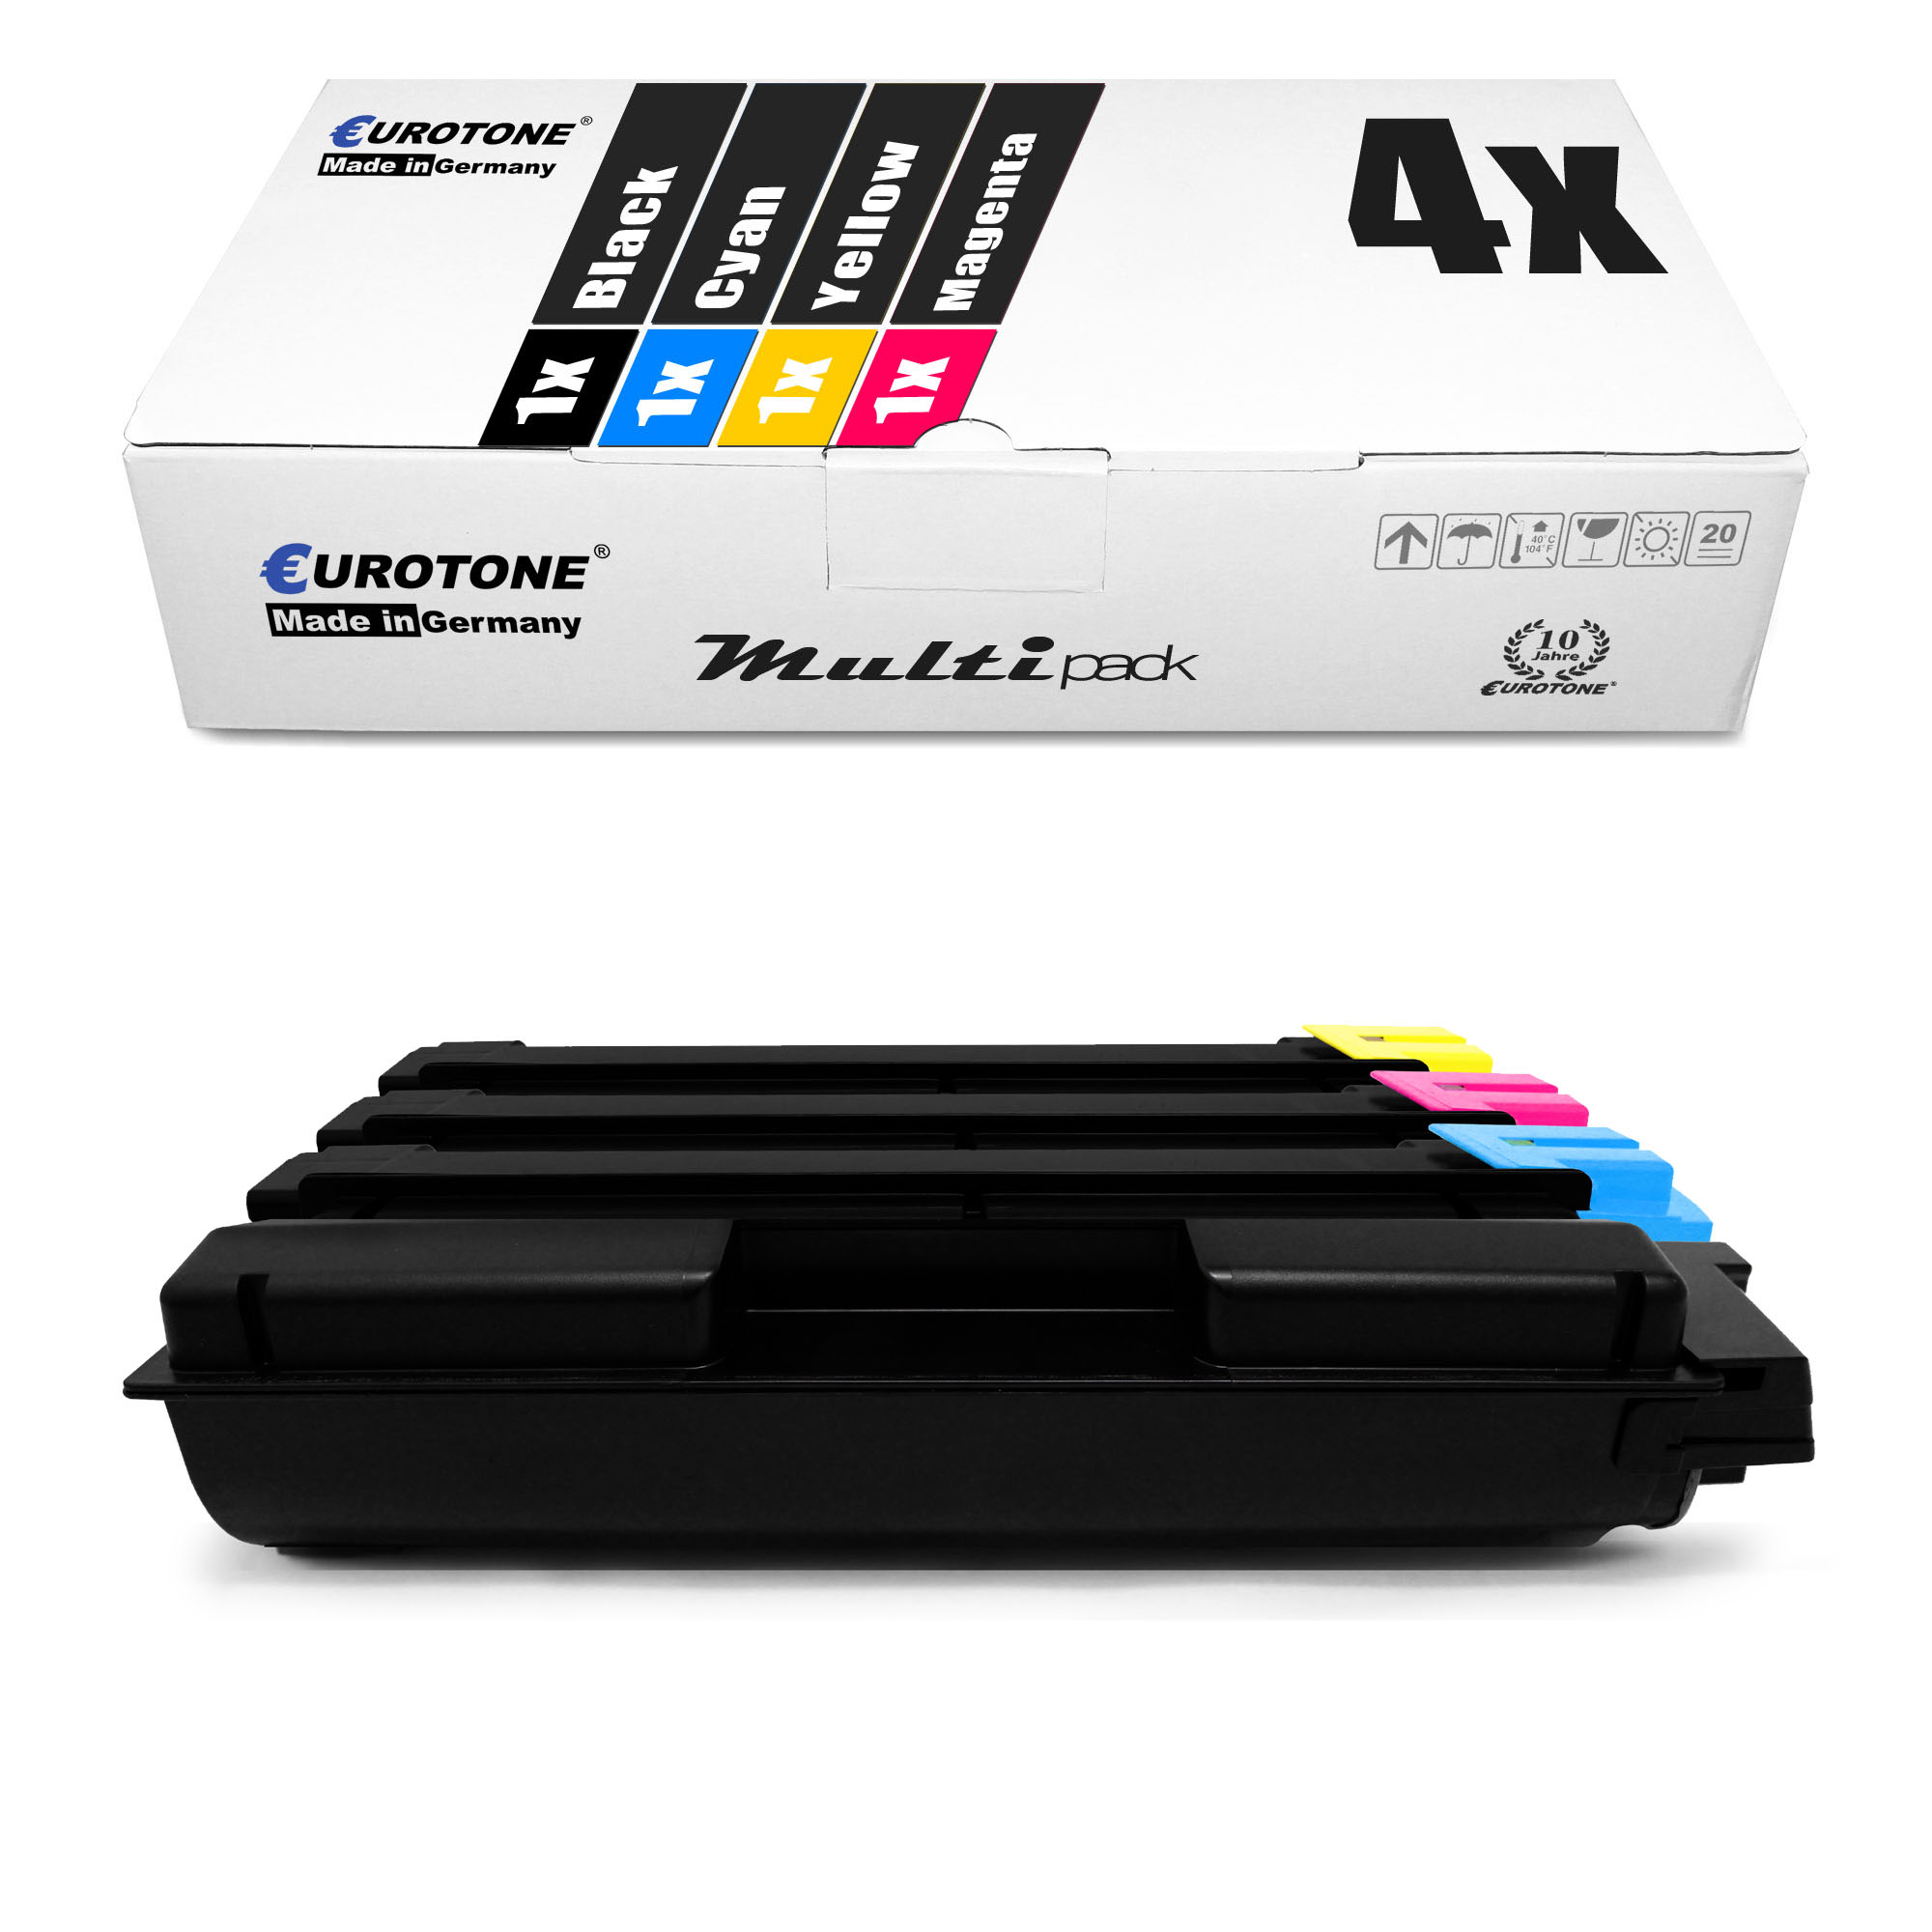 4x-eurotone-Pro-Cartouche-remplace-Kyocera-TK-5140-C-TK-5140-K-TK-5140-M-TK-5140-Y miniature 2